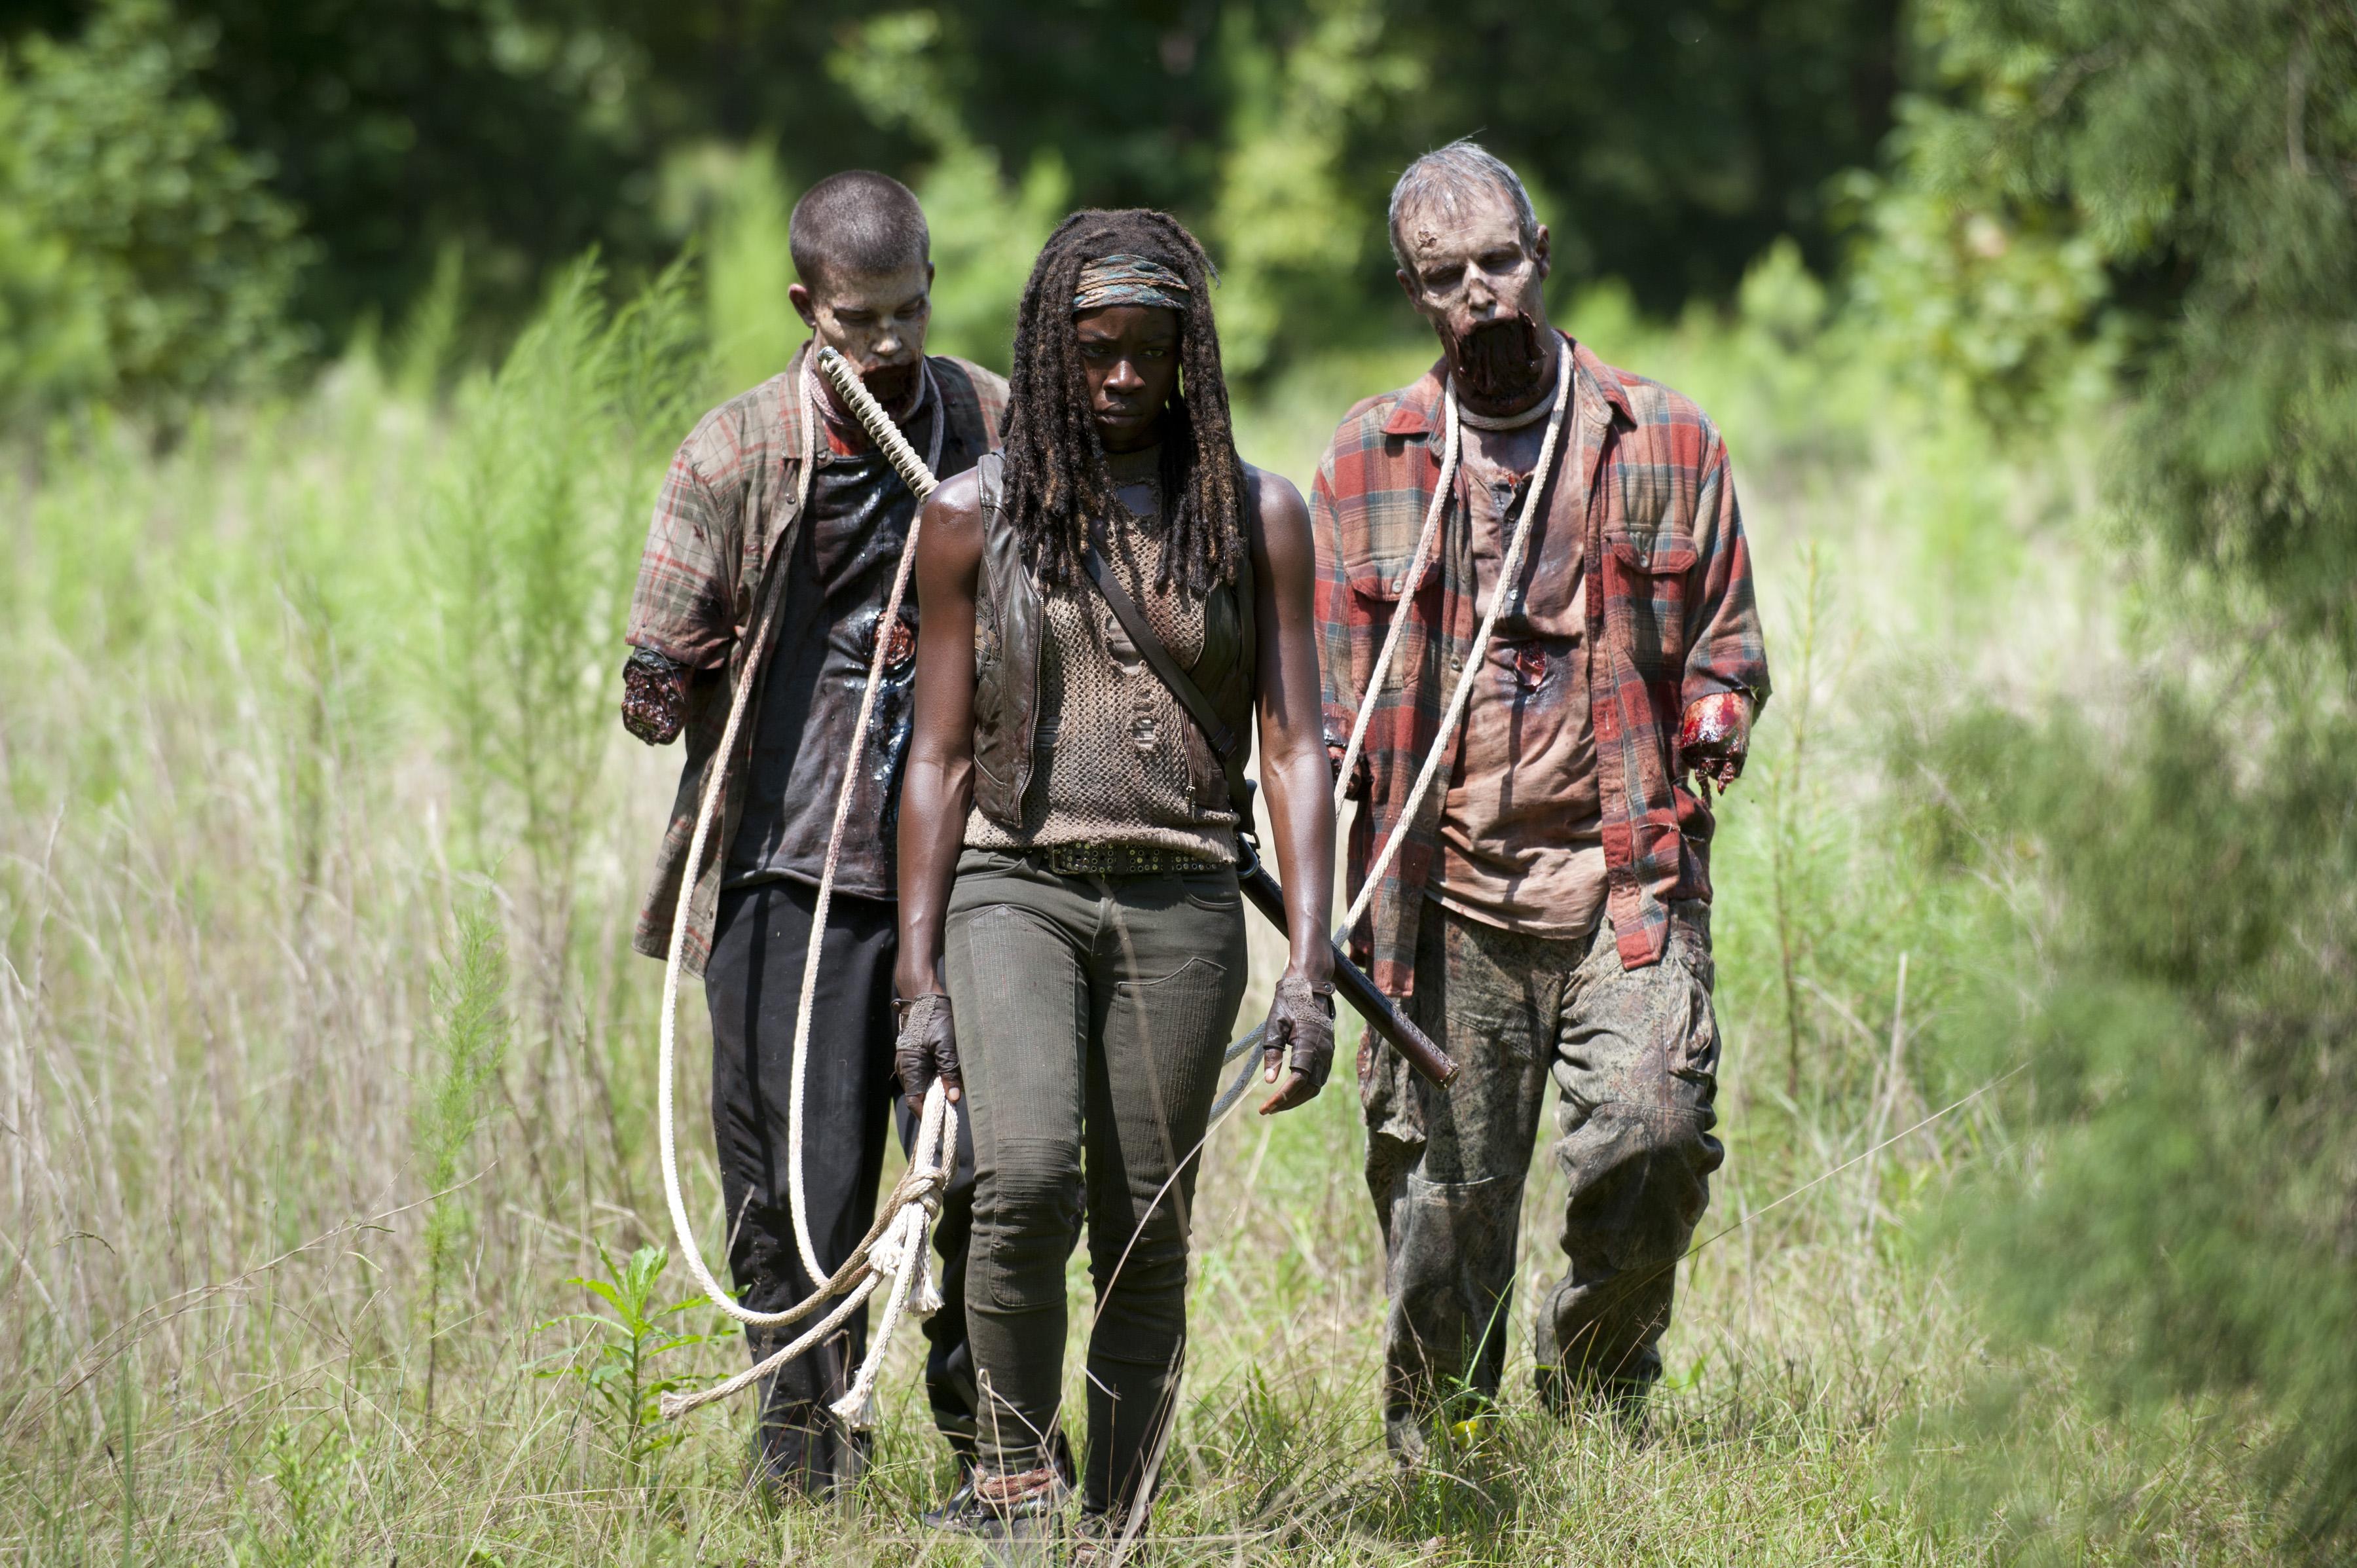 5 Things We Learned From 'The Walking Dead' Mid-Season Premiere